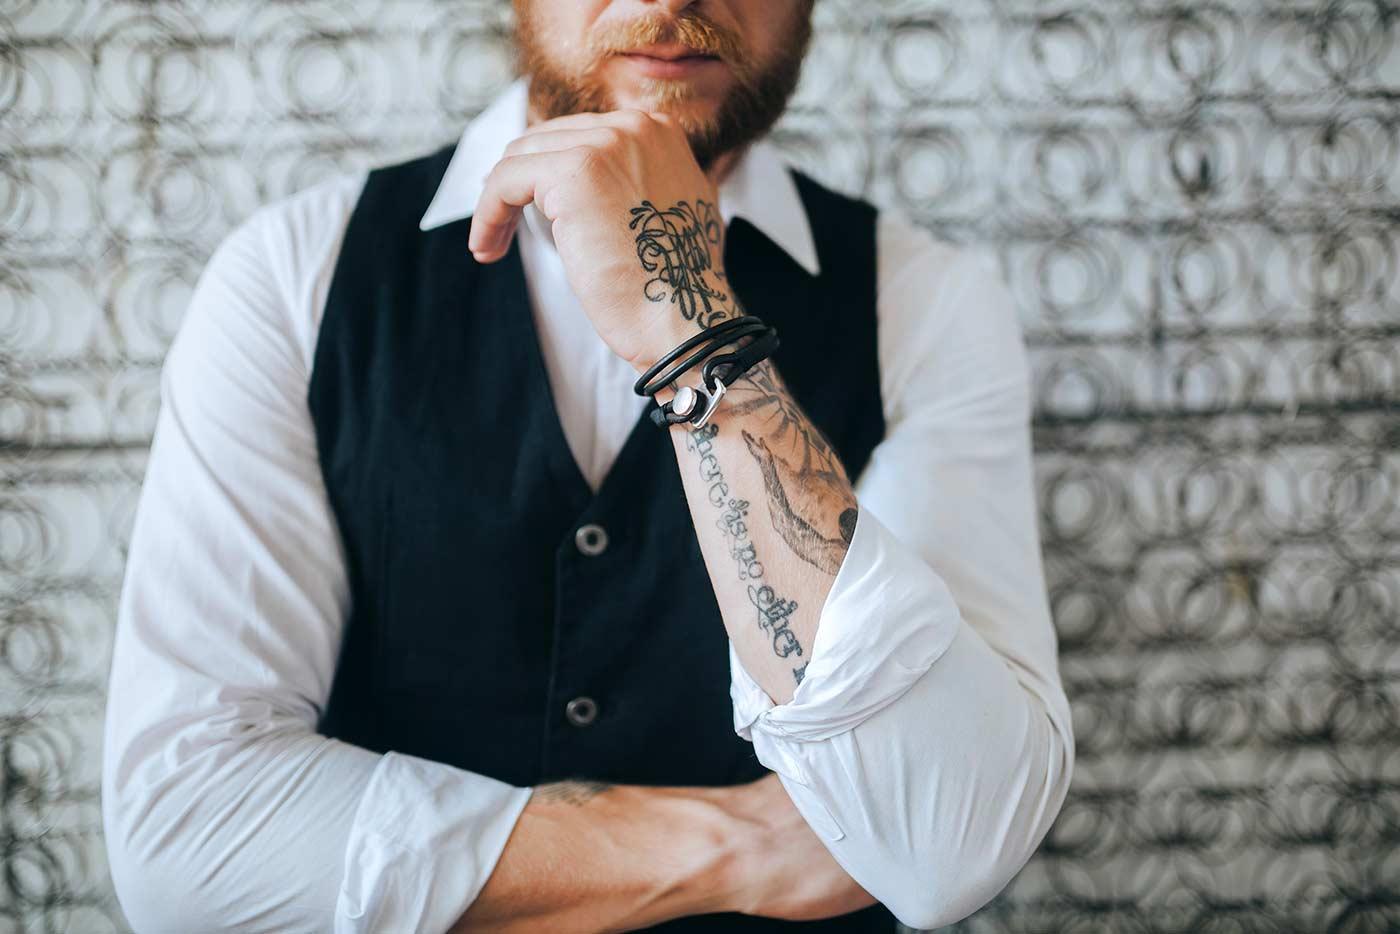 Bräutigam mit Tattoos